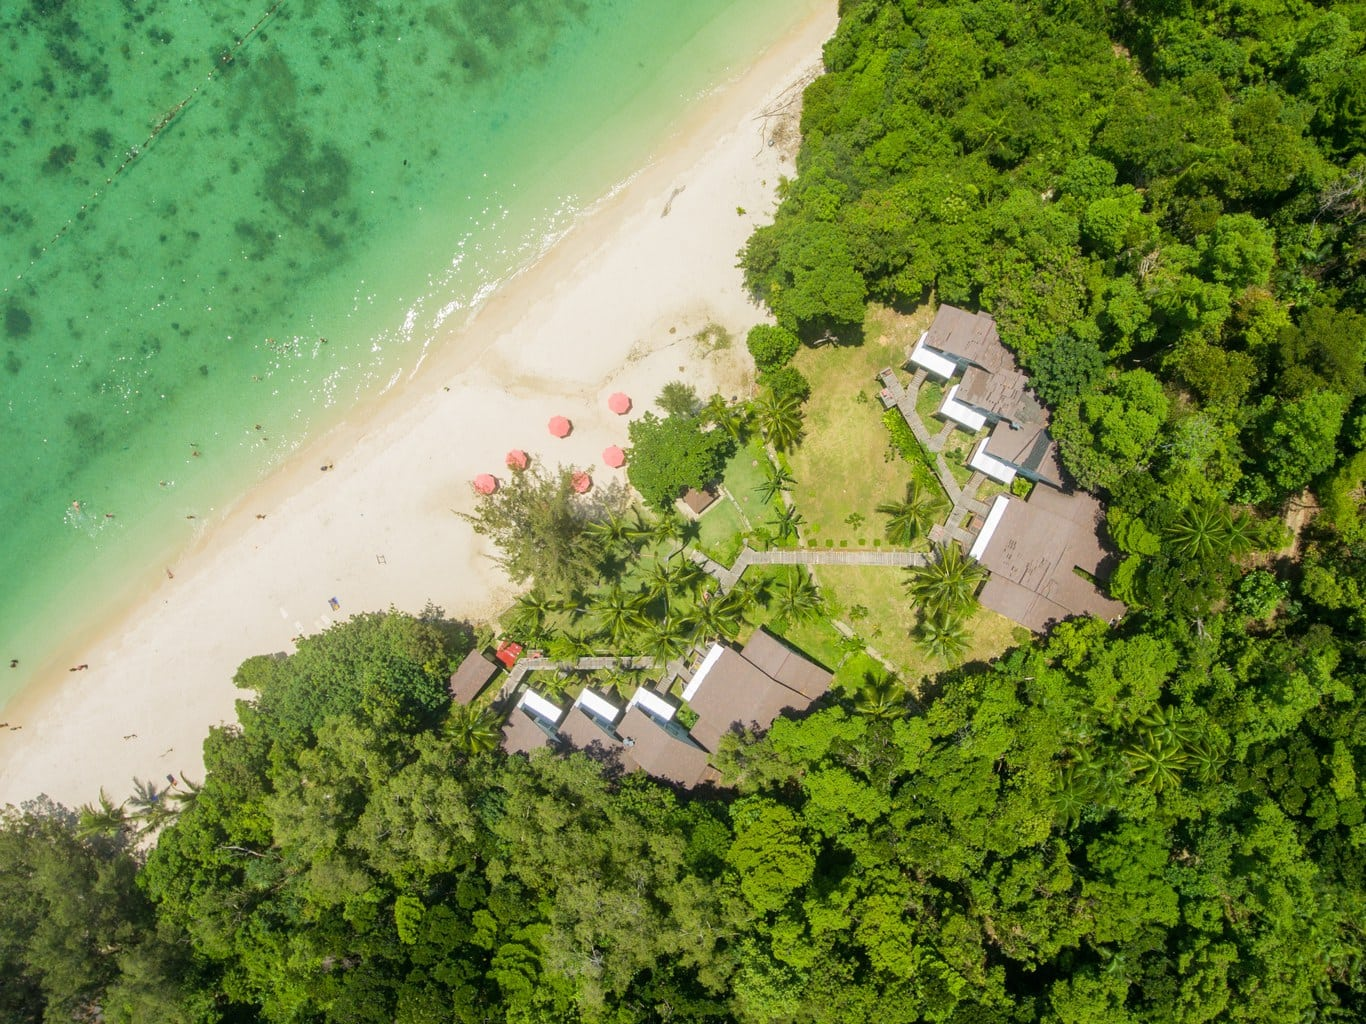 Drone of Manukan island resort